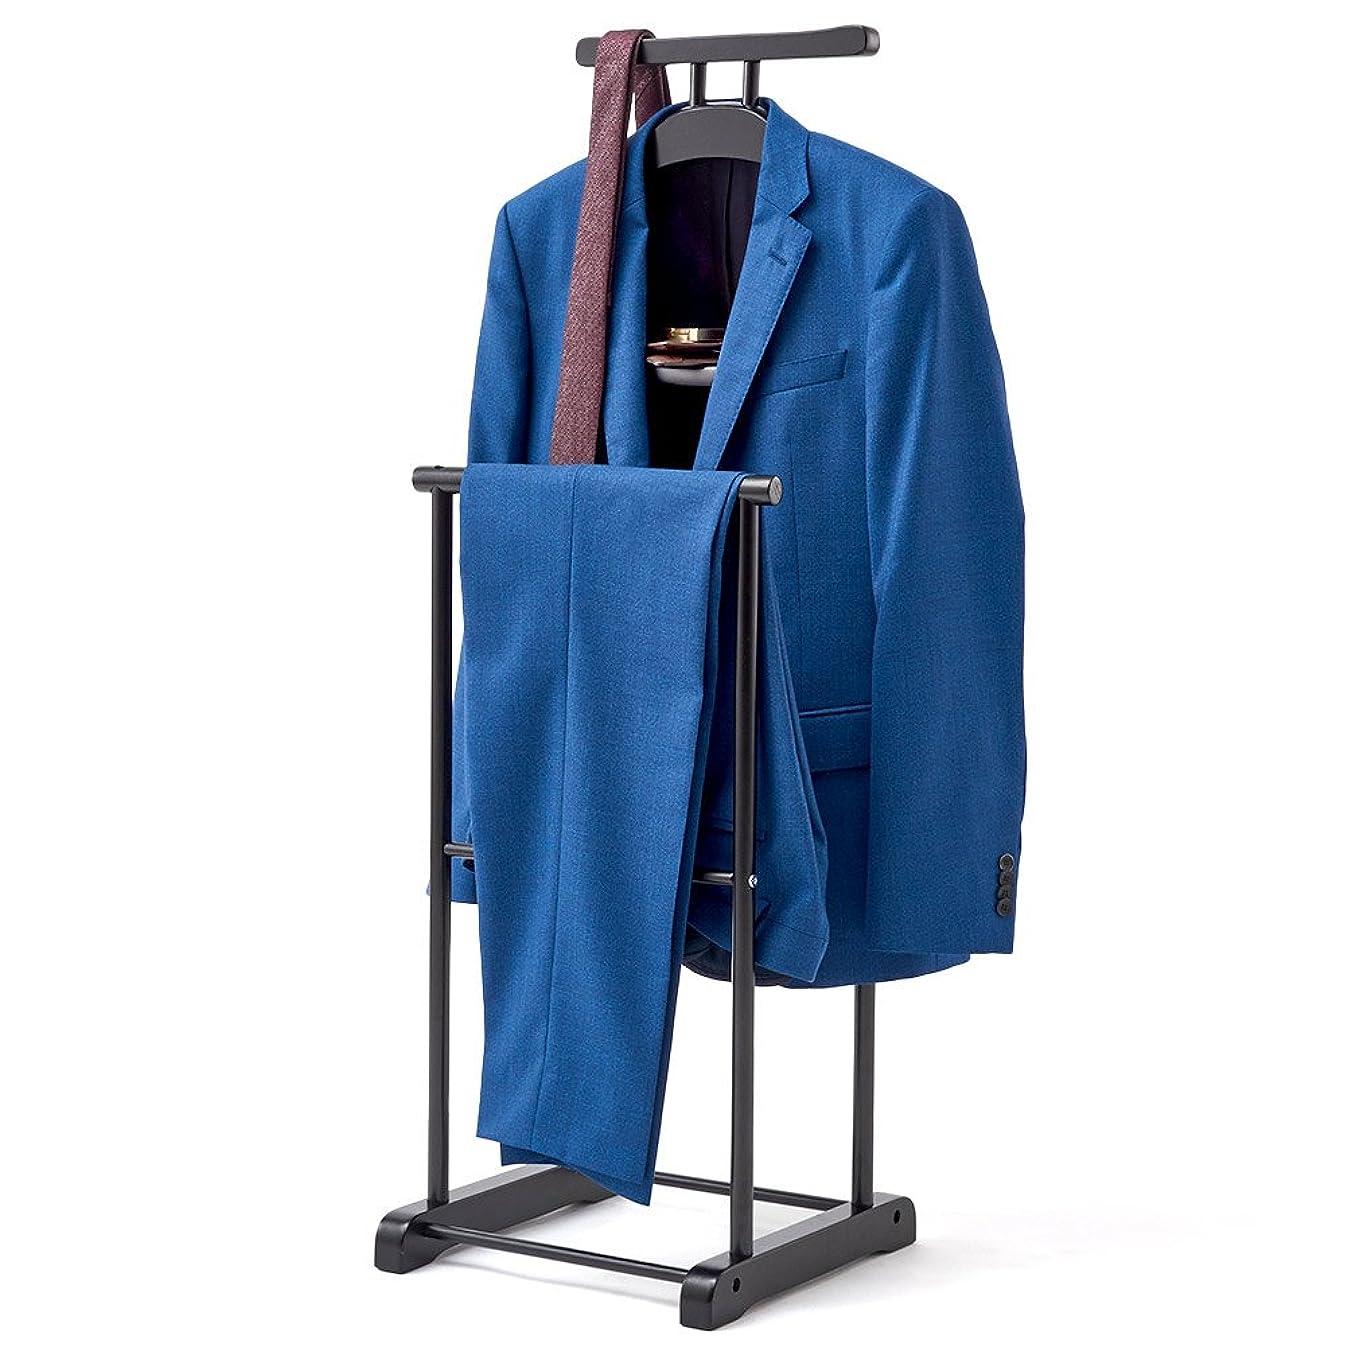 EZOWare Clothes Valet Stand for Men, Suit Coat Clothing Wardrobe Hanging Rack Organizer – Black